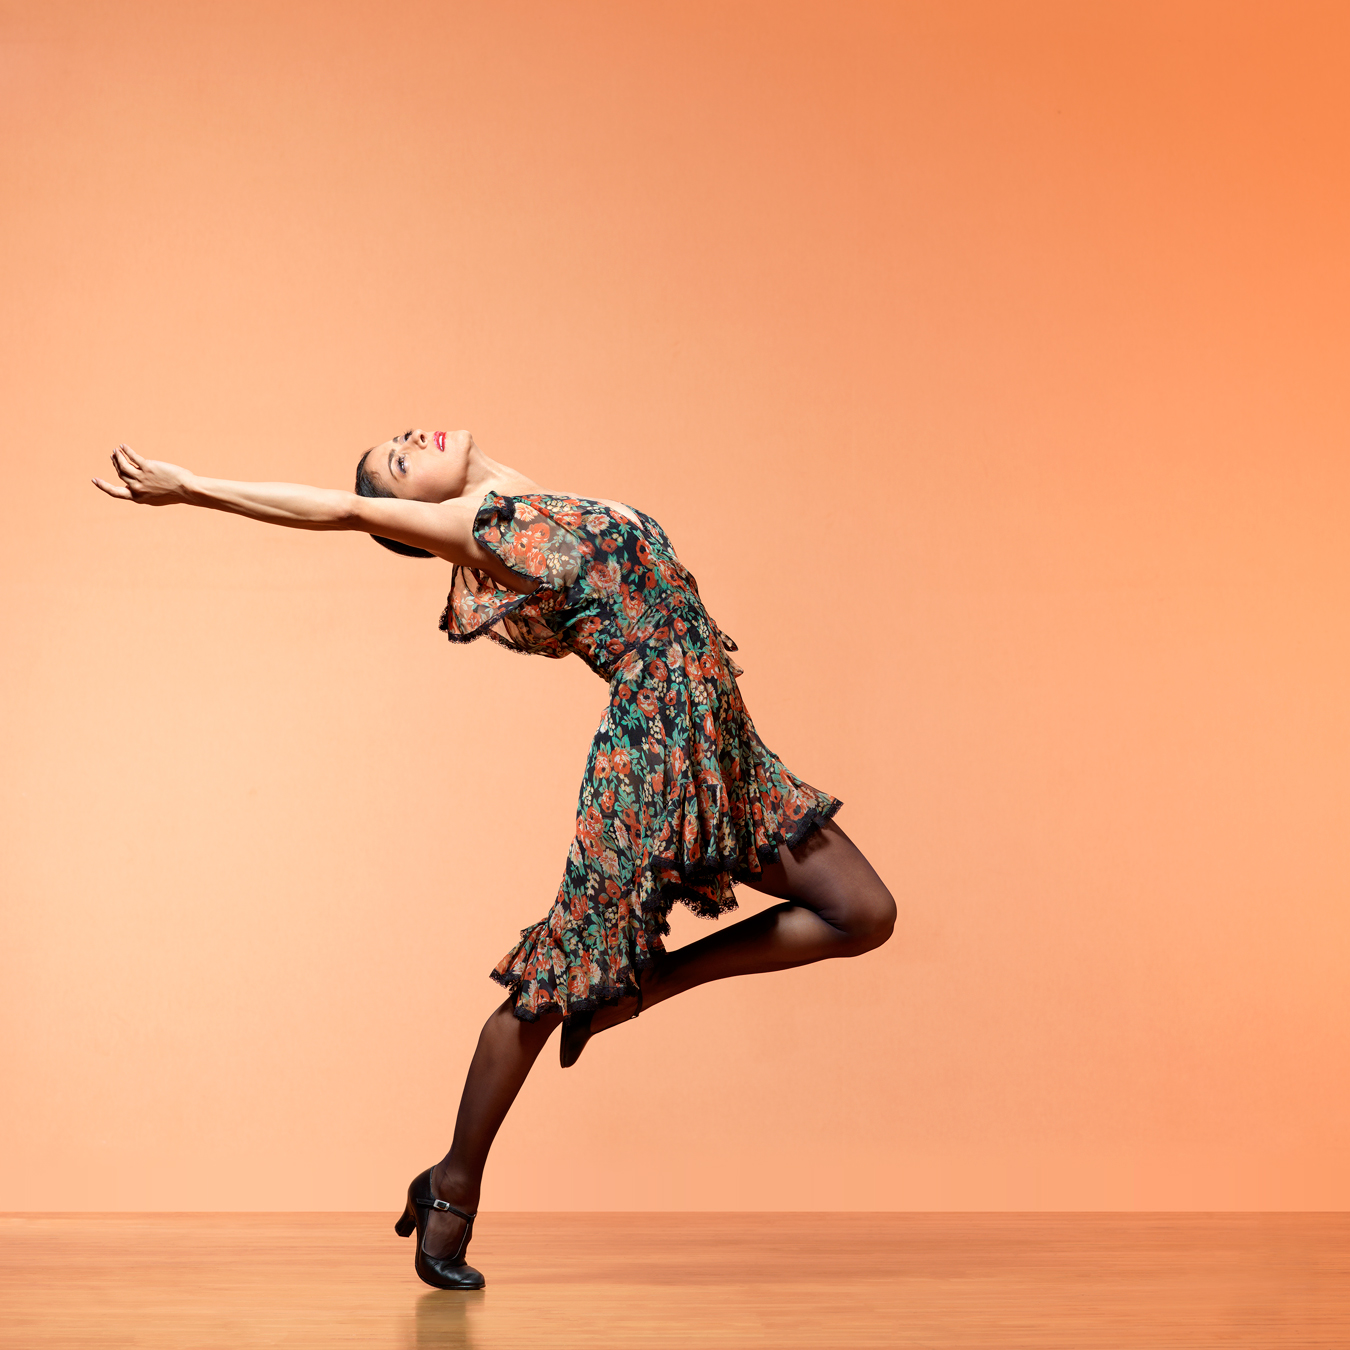 Photo by: Matthew Karas, Courtesy of Dance Magazine